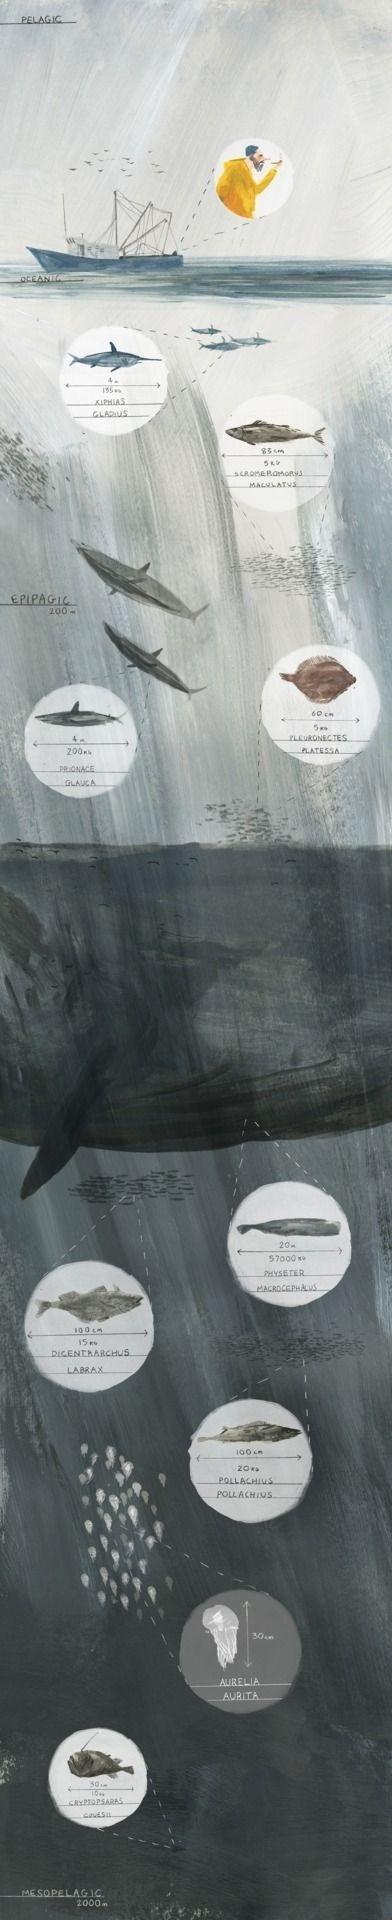 Joe Todd Stanton. http://joetoddstanton.com/ #whale #fisherman #fish #illustration #boat